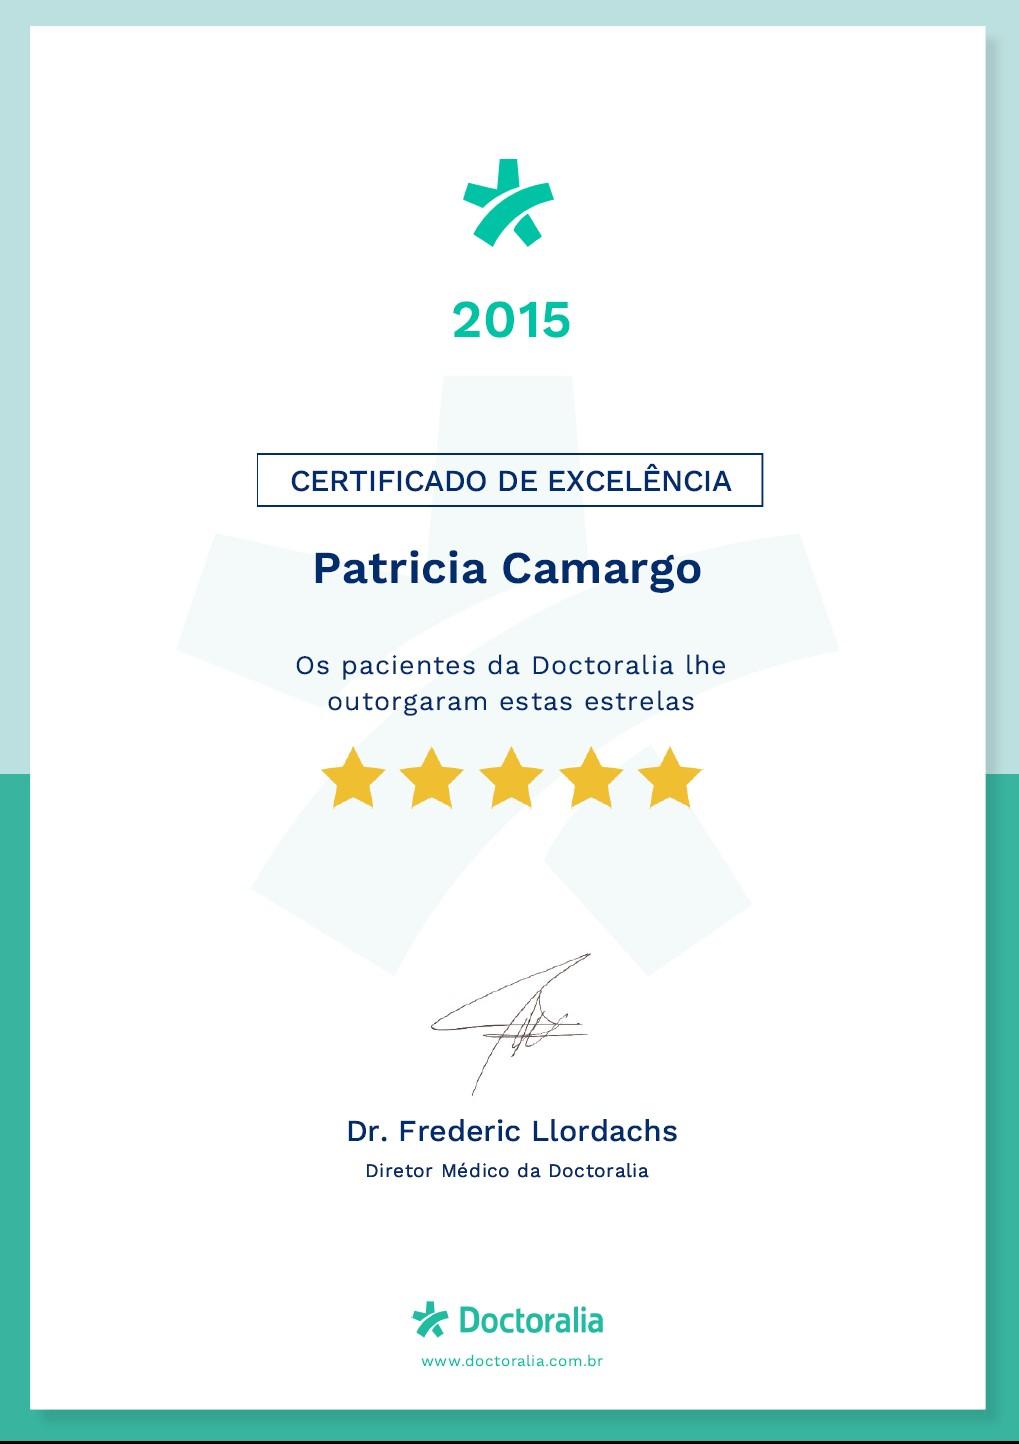 Certificado de Excelência Doctoralia 2015